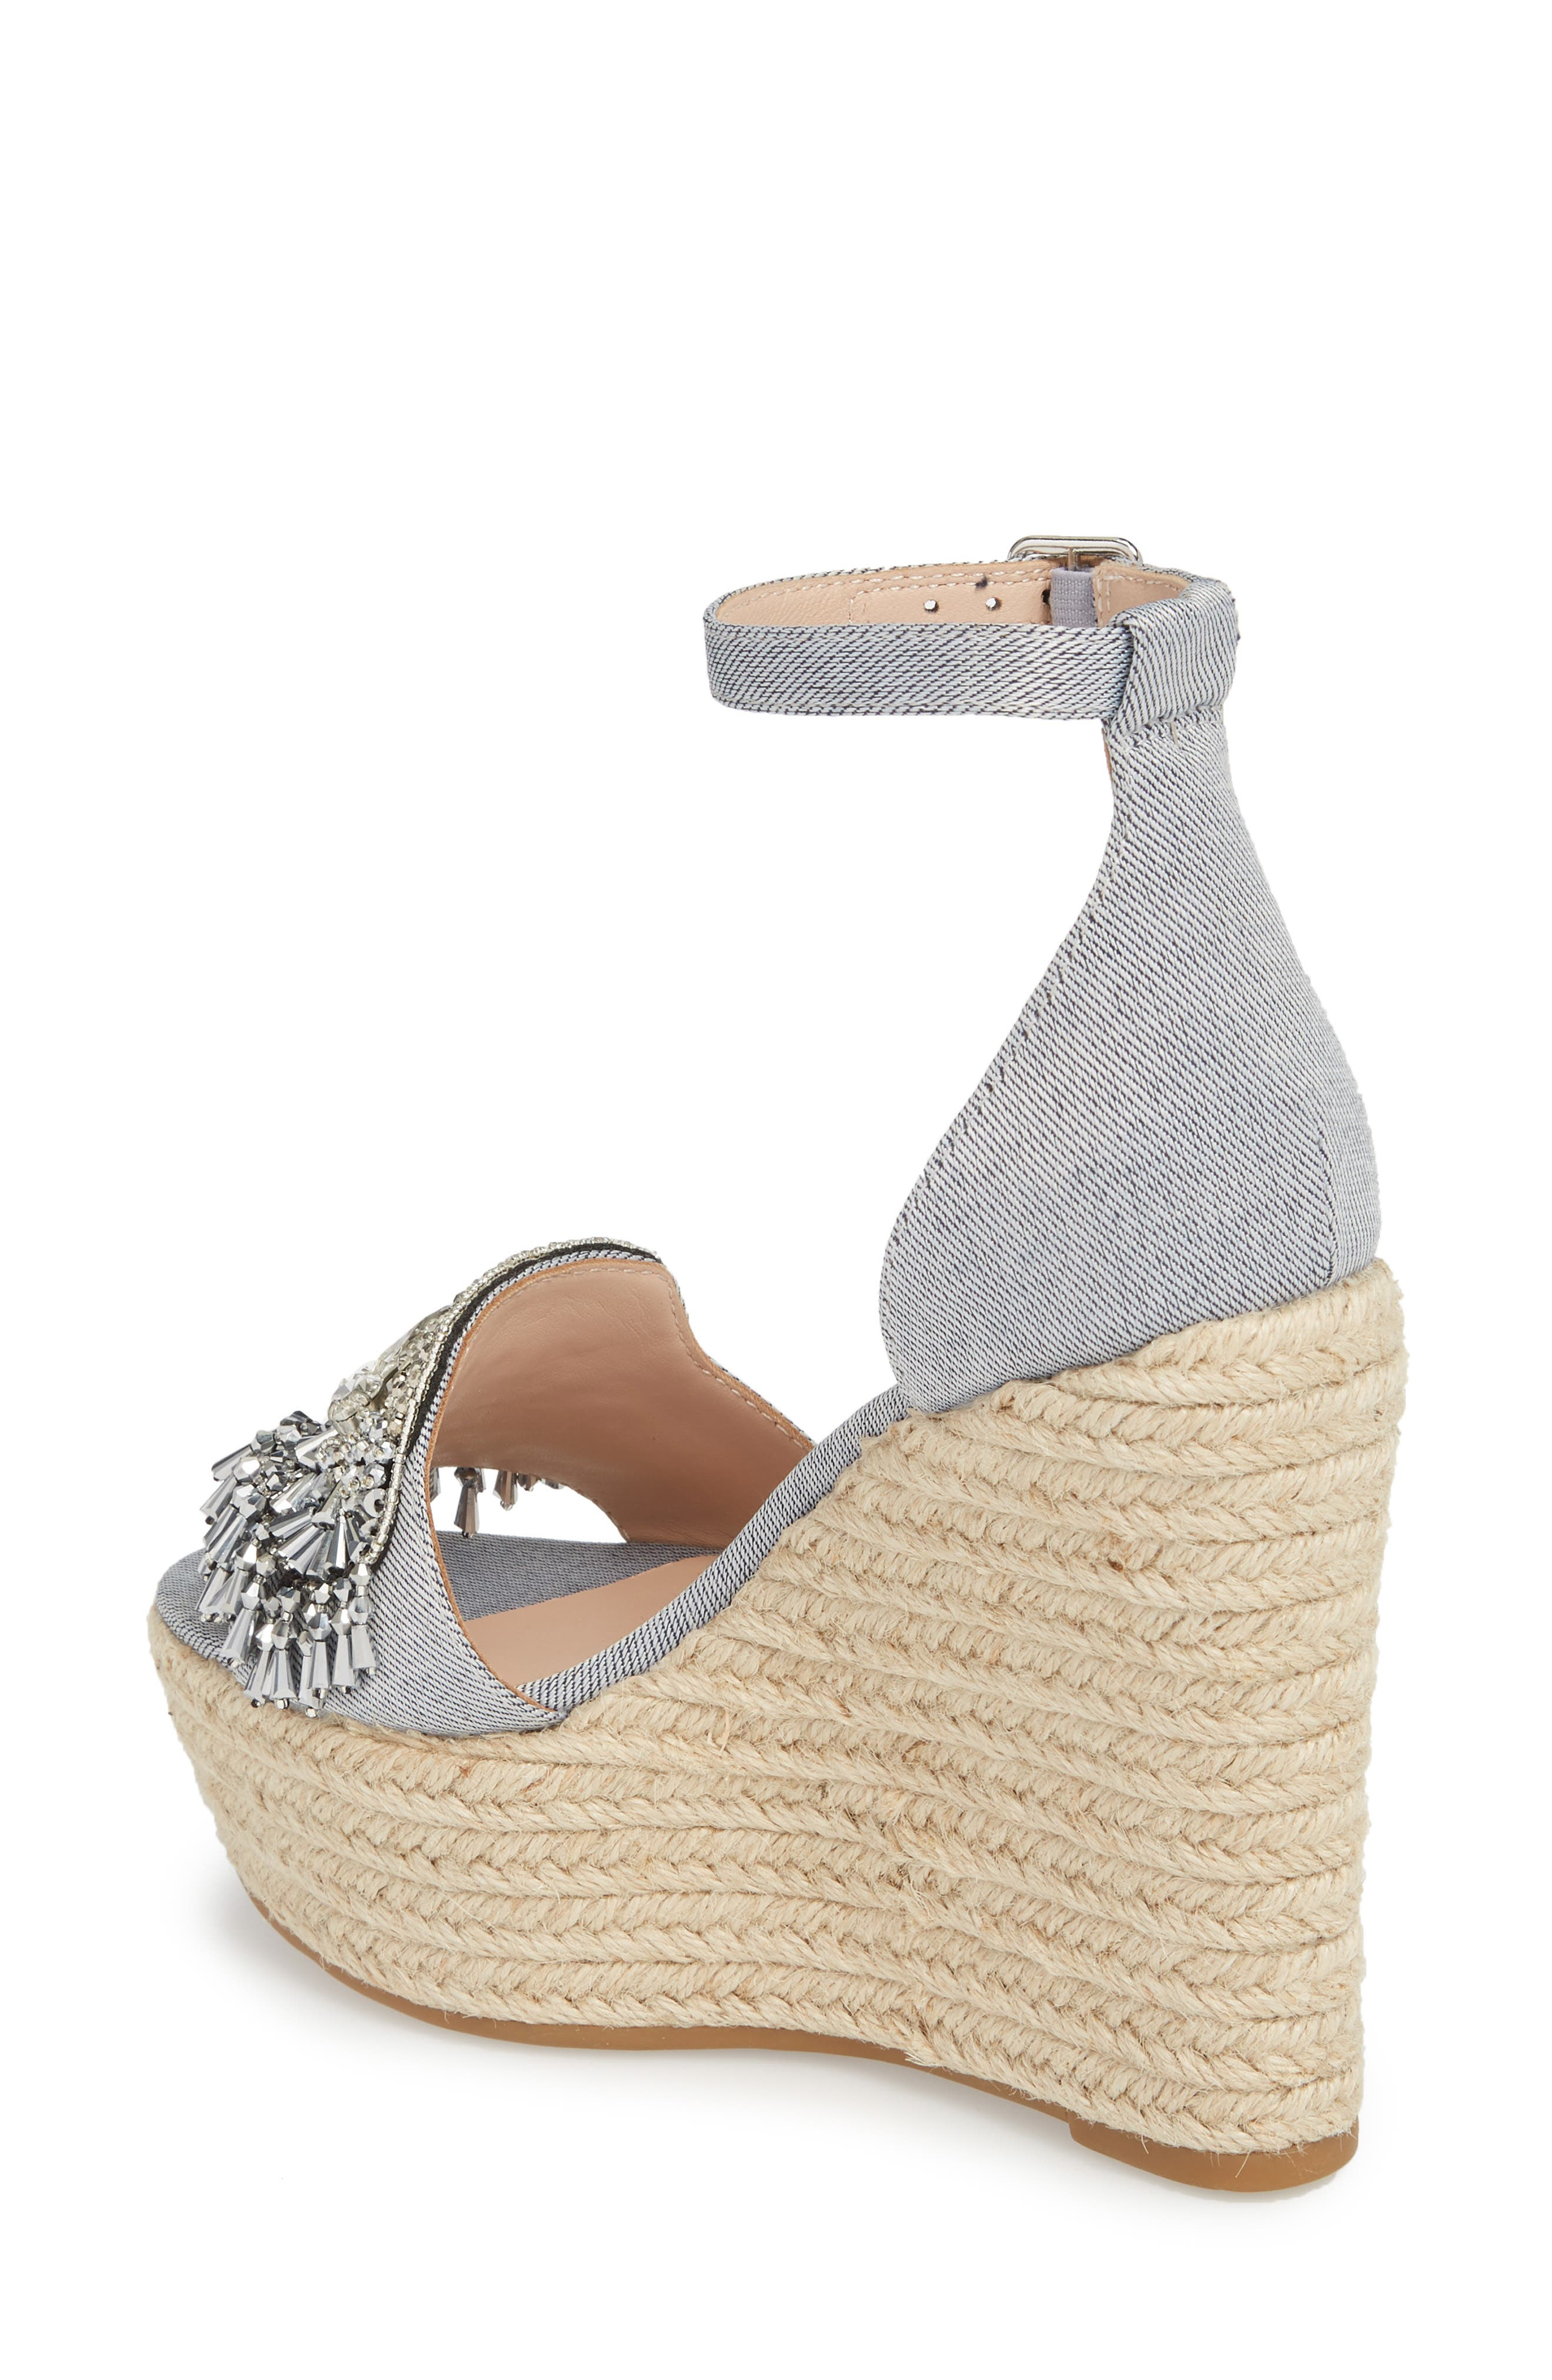 Maxim Platform Wedge Sandal,                             Alternate thumbnail 5, color,